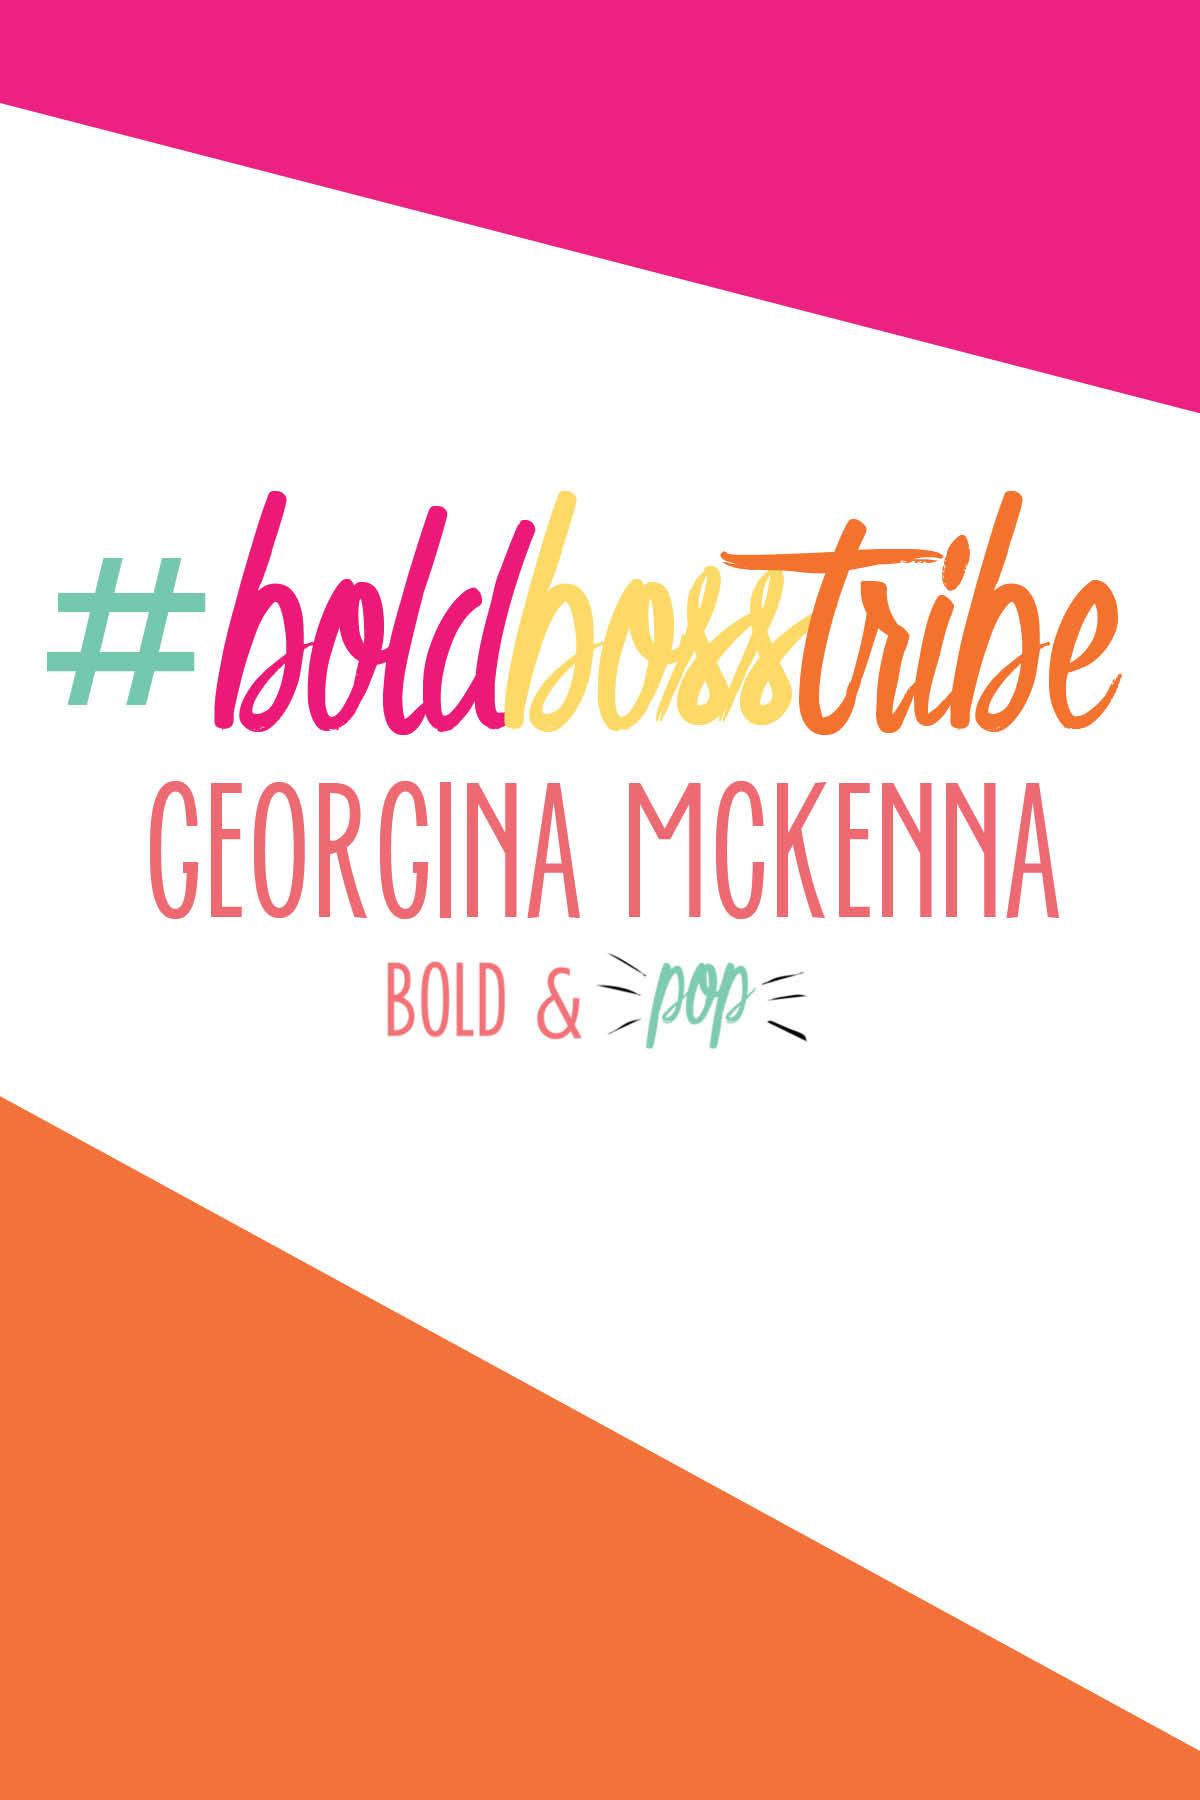 #BoldBossTribe :: Bold Boss Tribe Feature Georgina McKenna of Count Her In